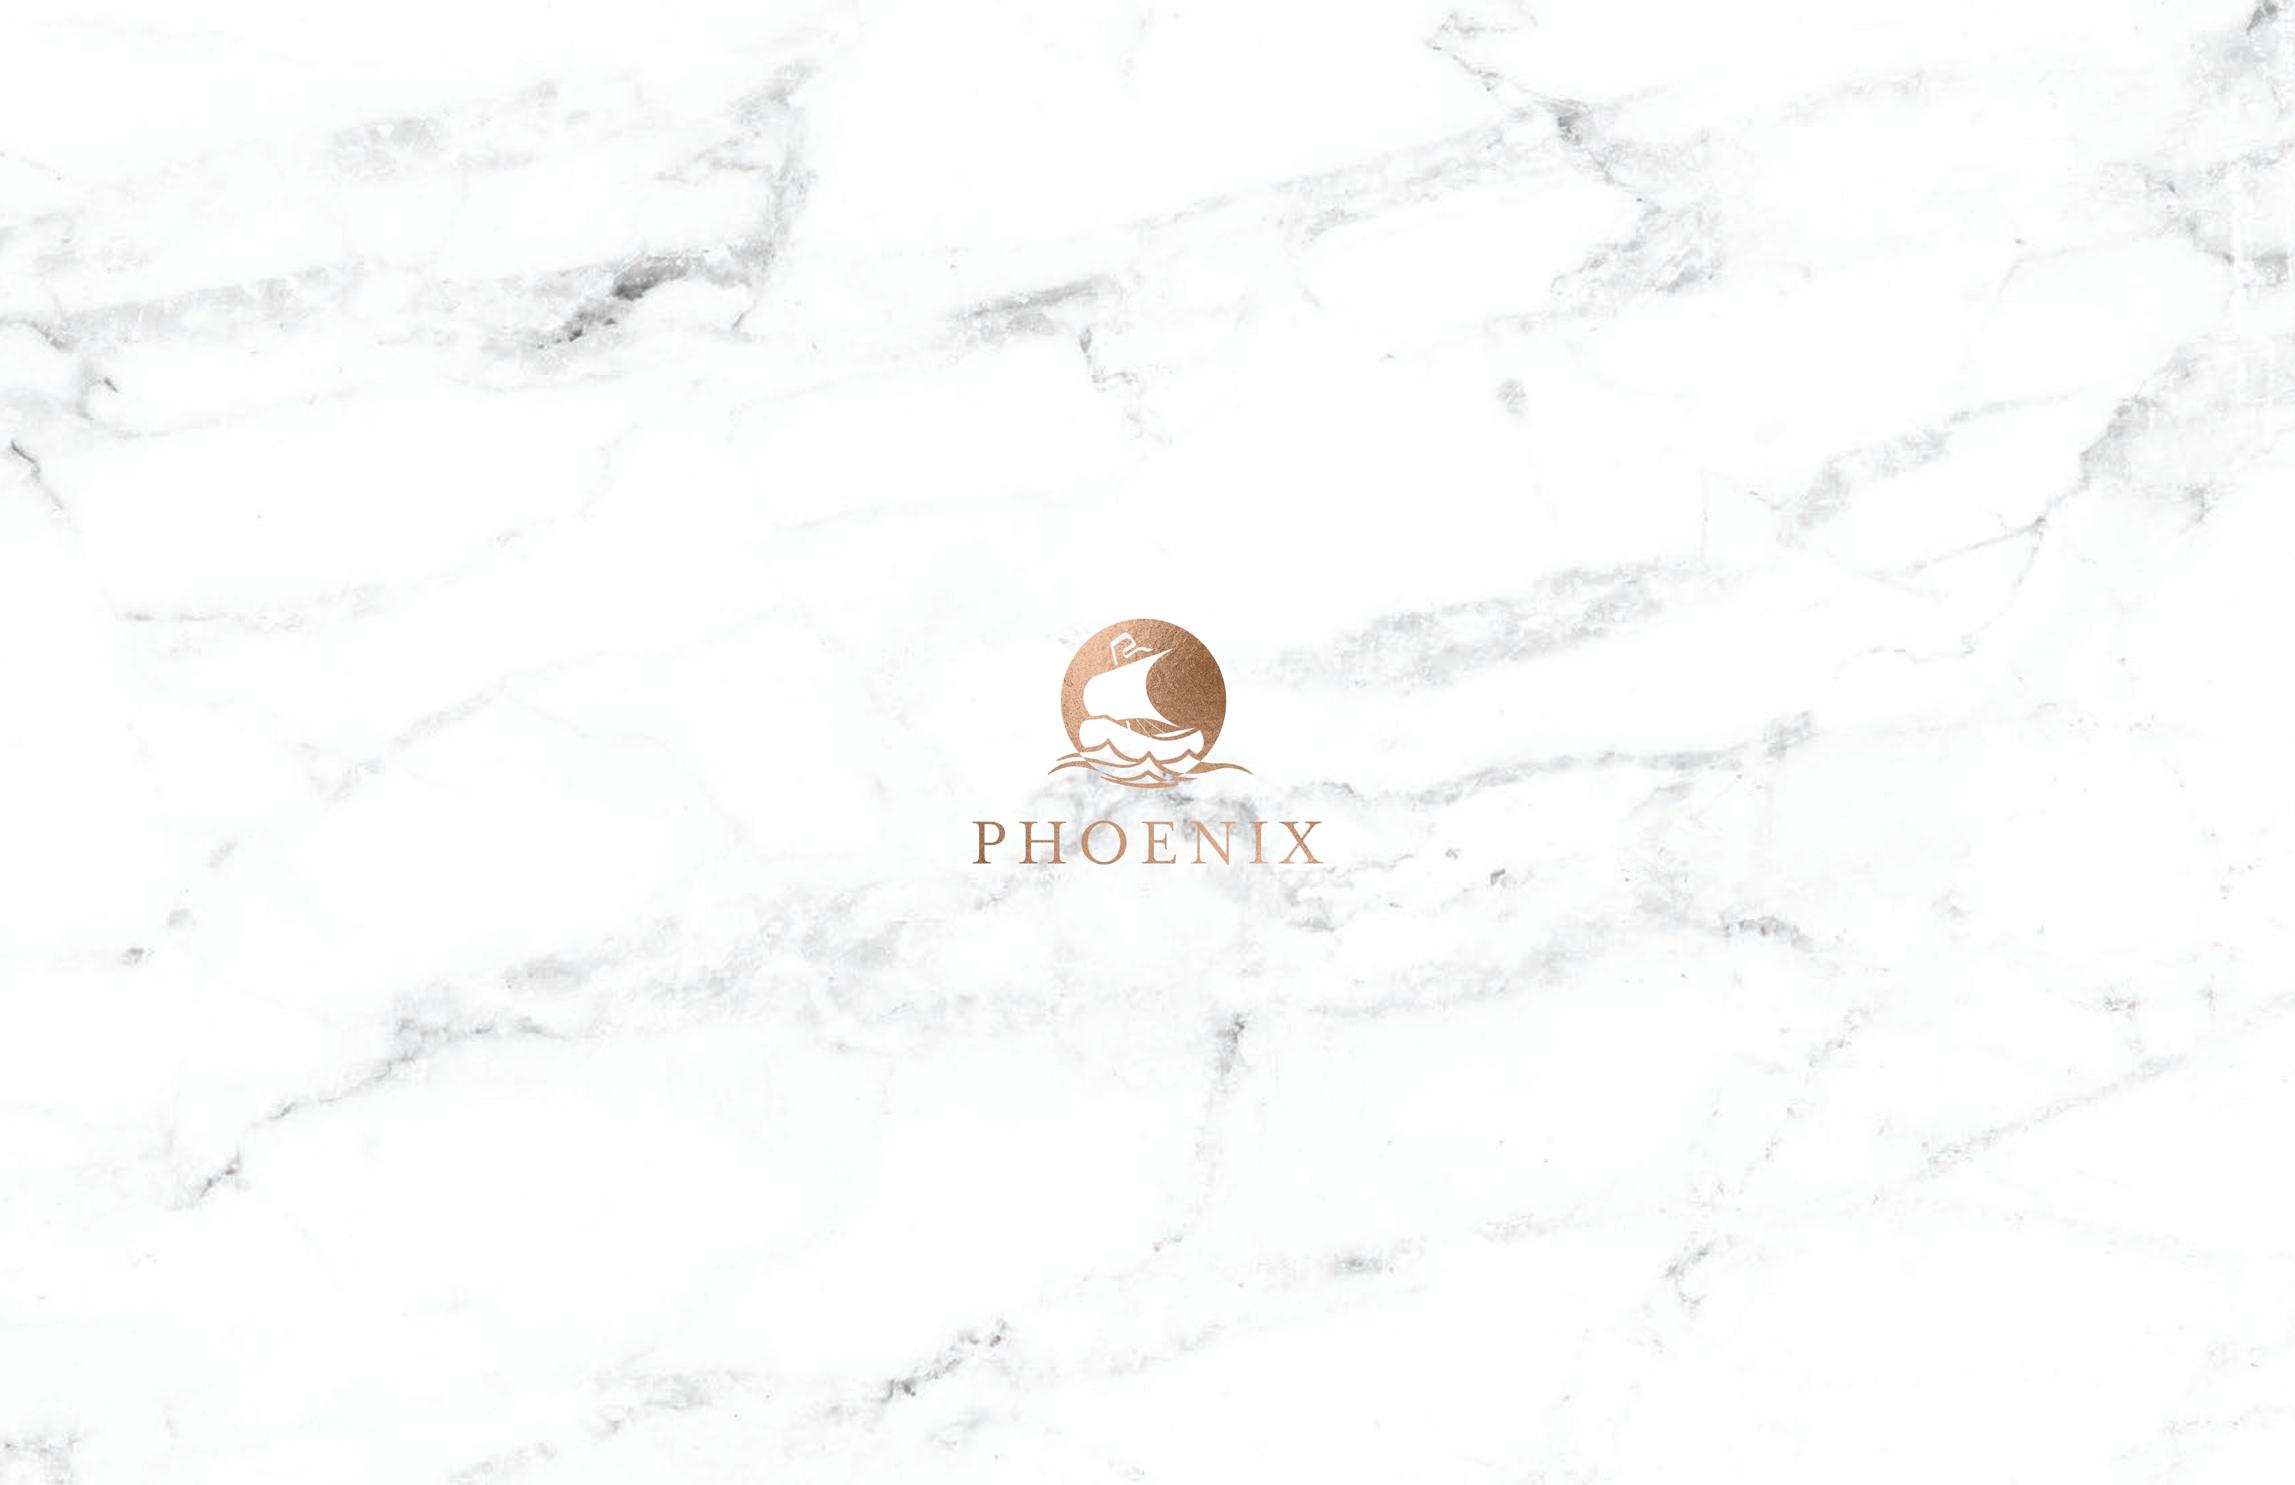 Phoenix - logo design